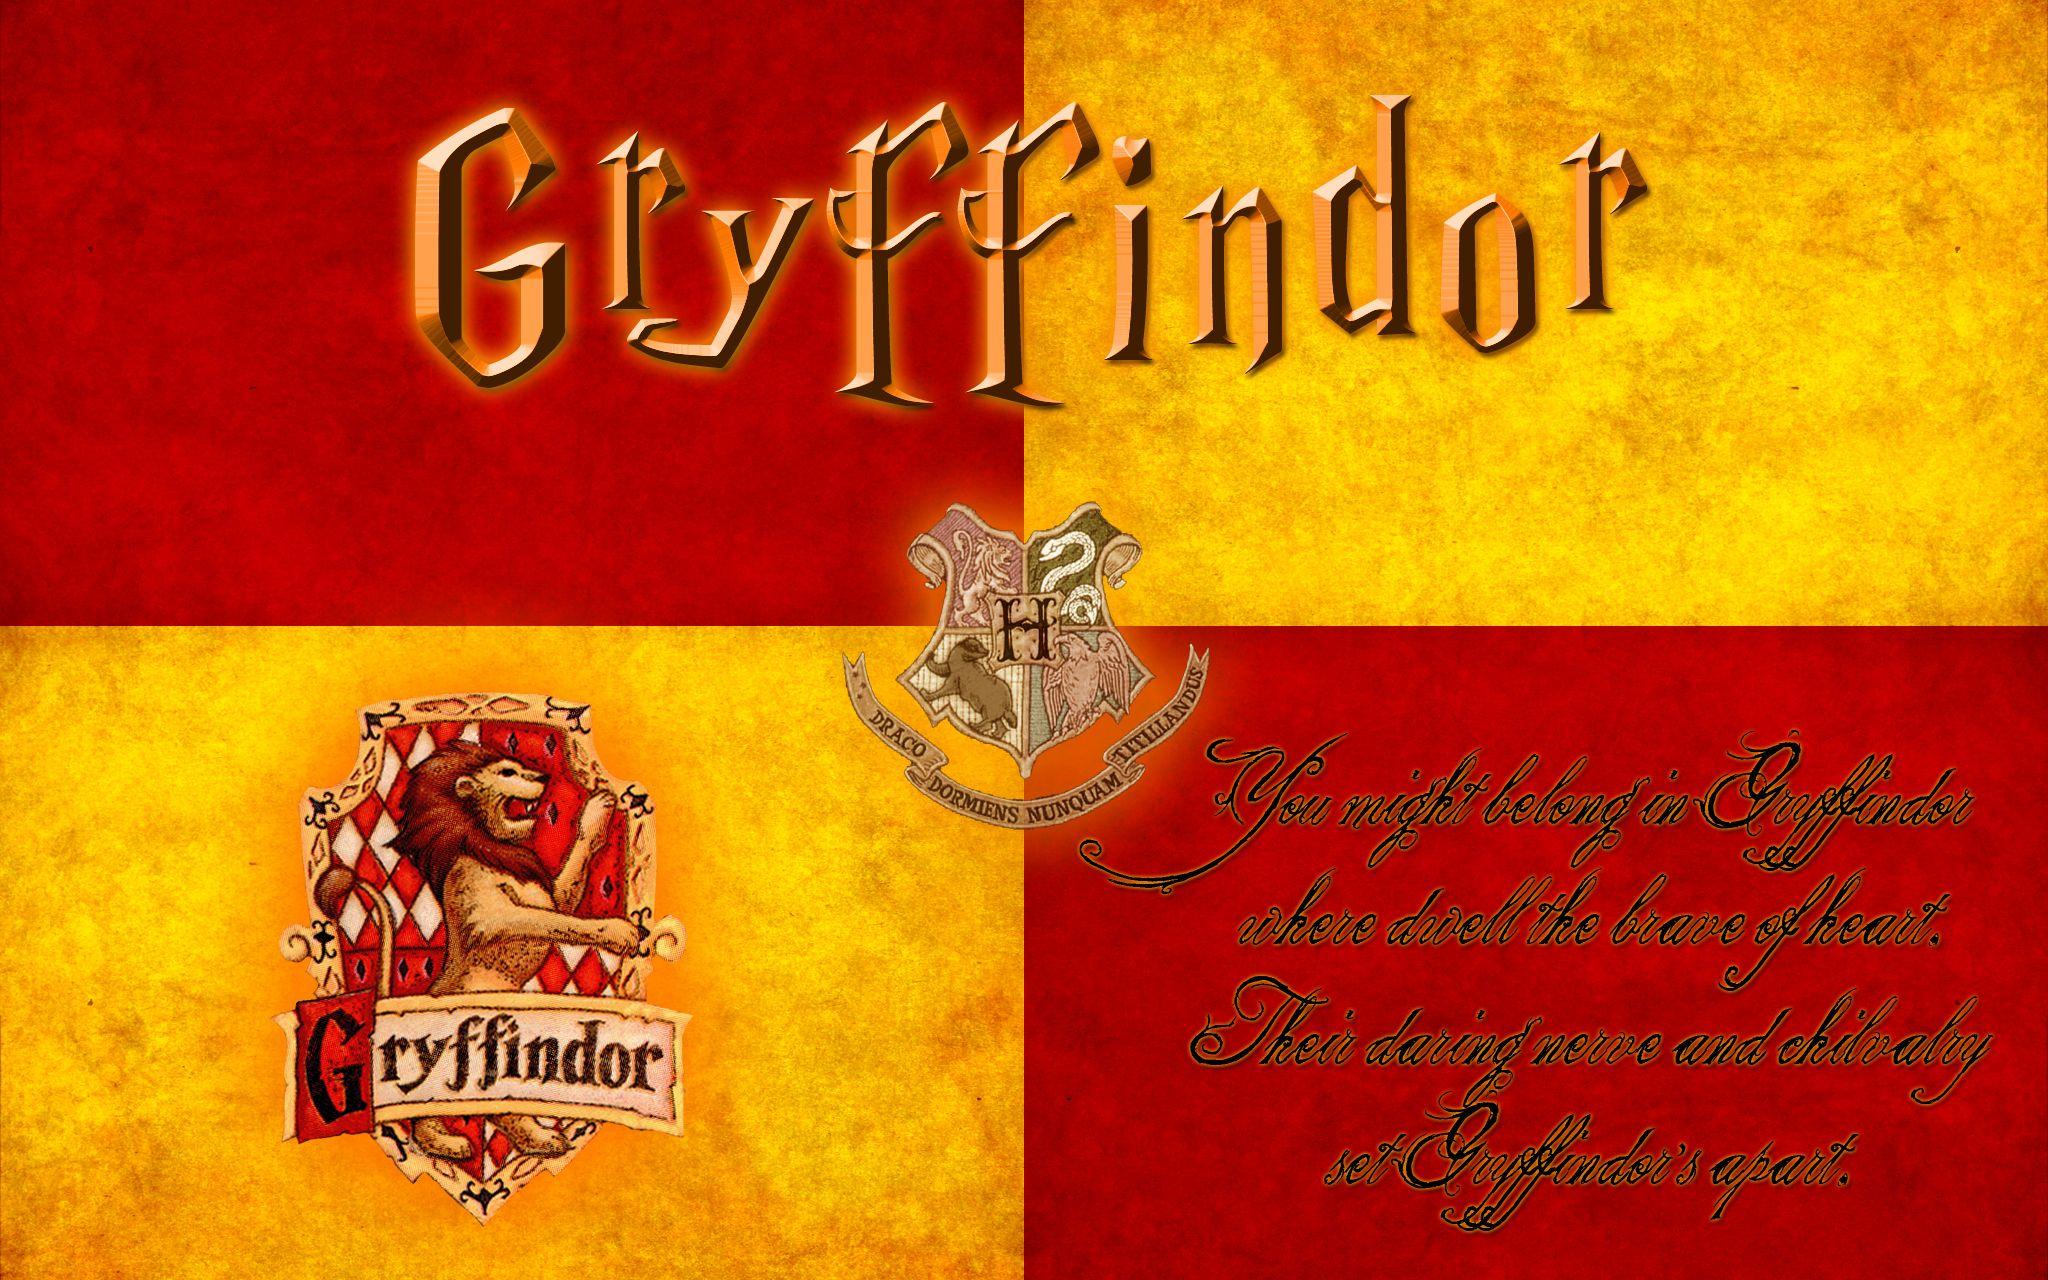 Gryffindor - Harry Potter Wallpaper (32294361) - Fanpop